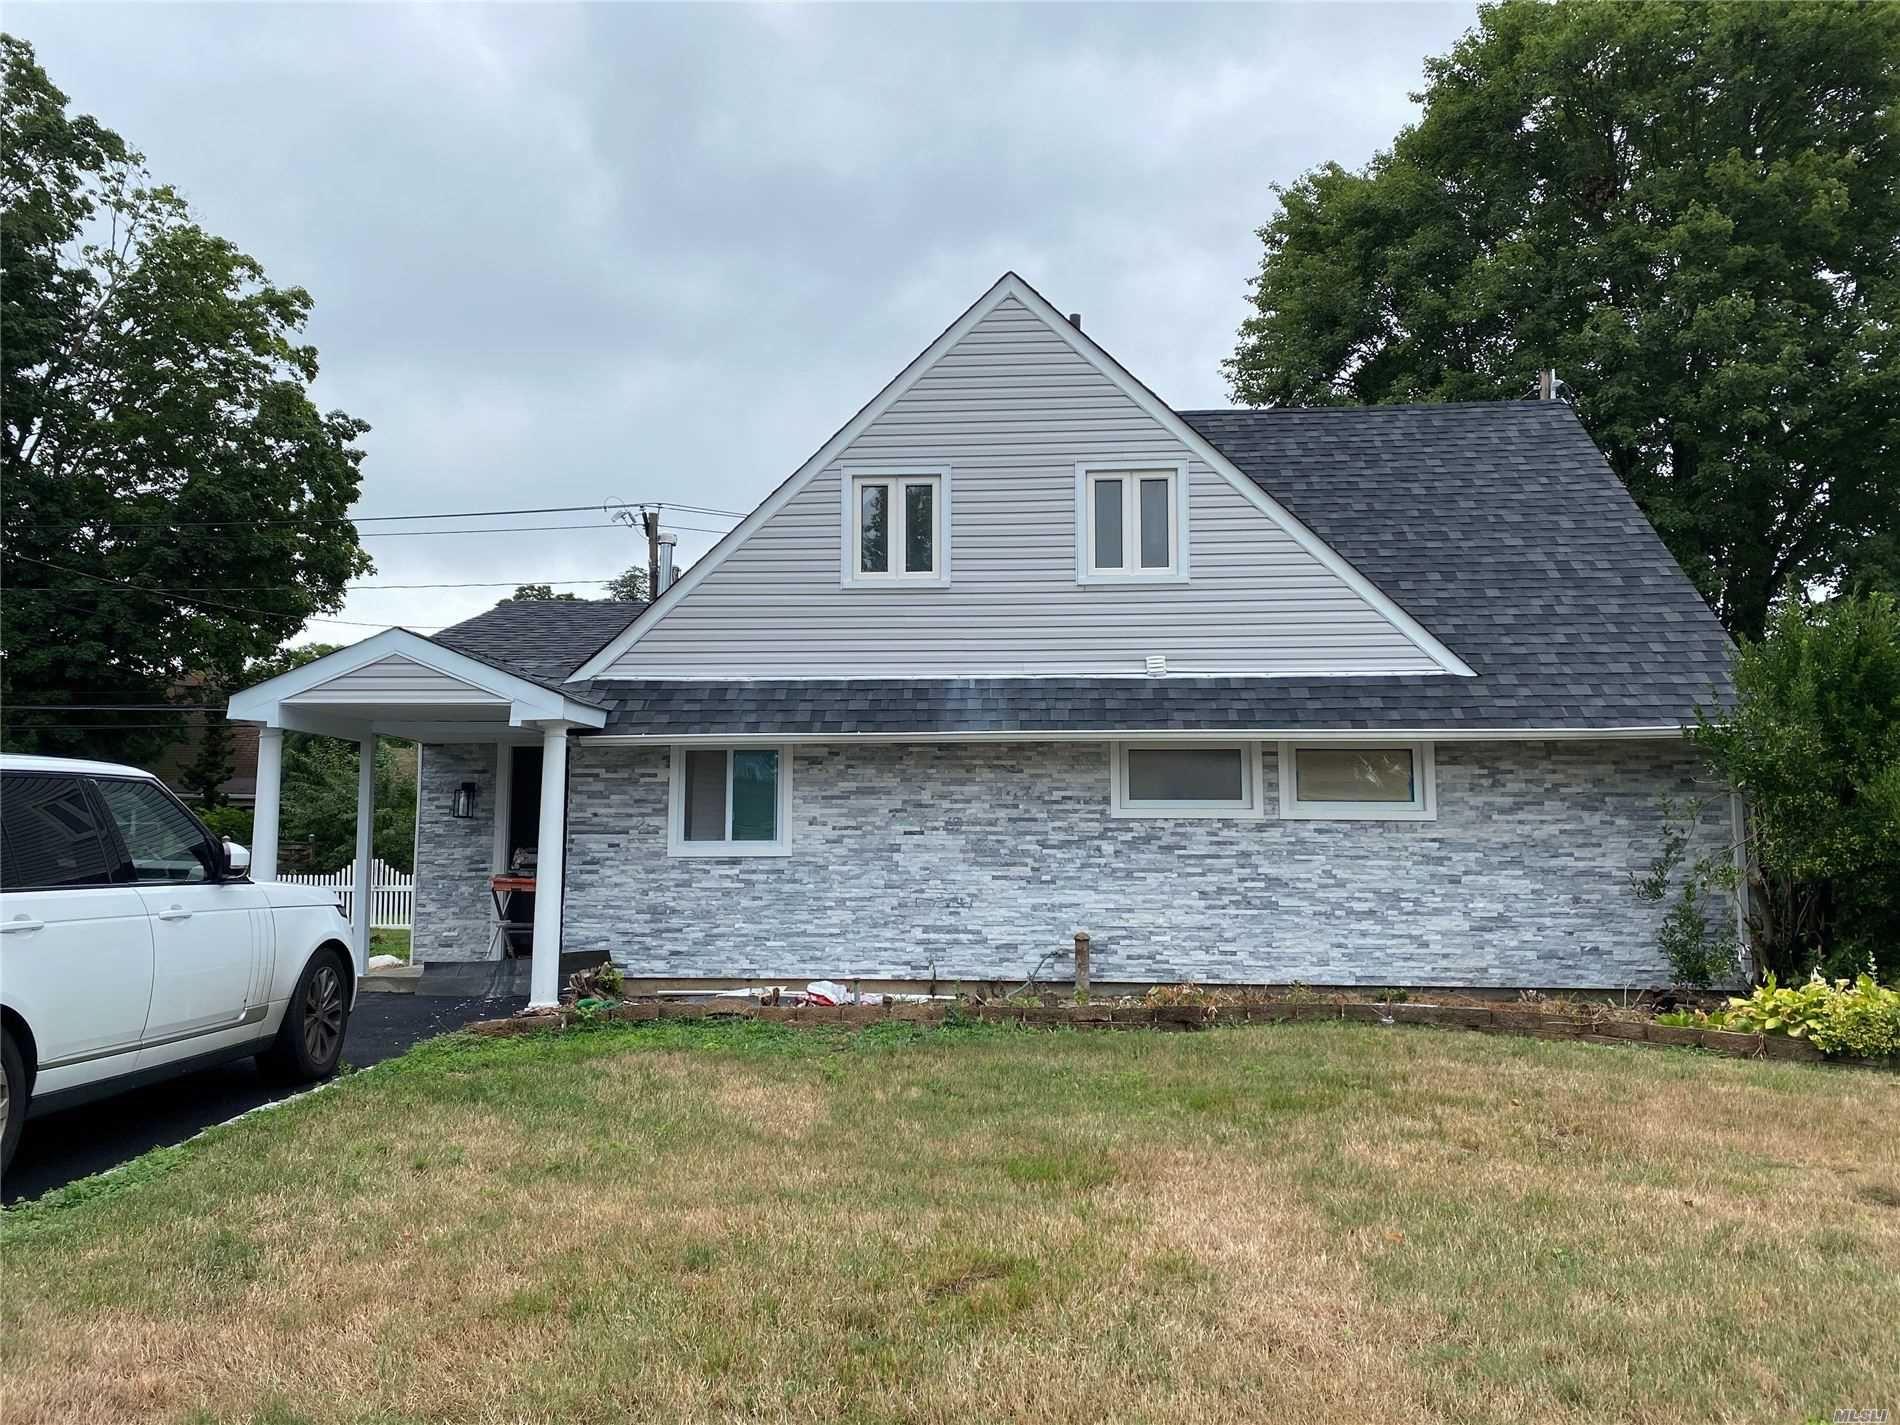 49 Blacksmith Rd, Levittown, NY 11756 - MLS#: 3235344